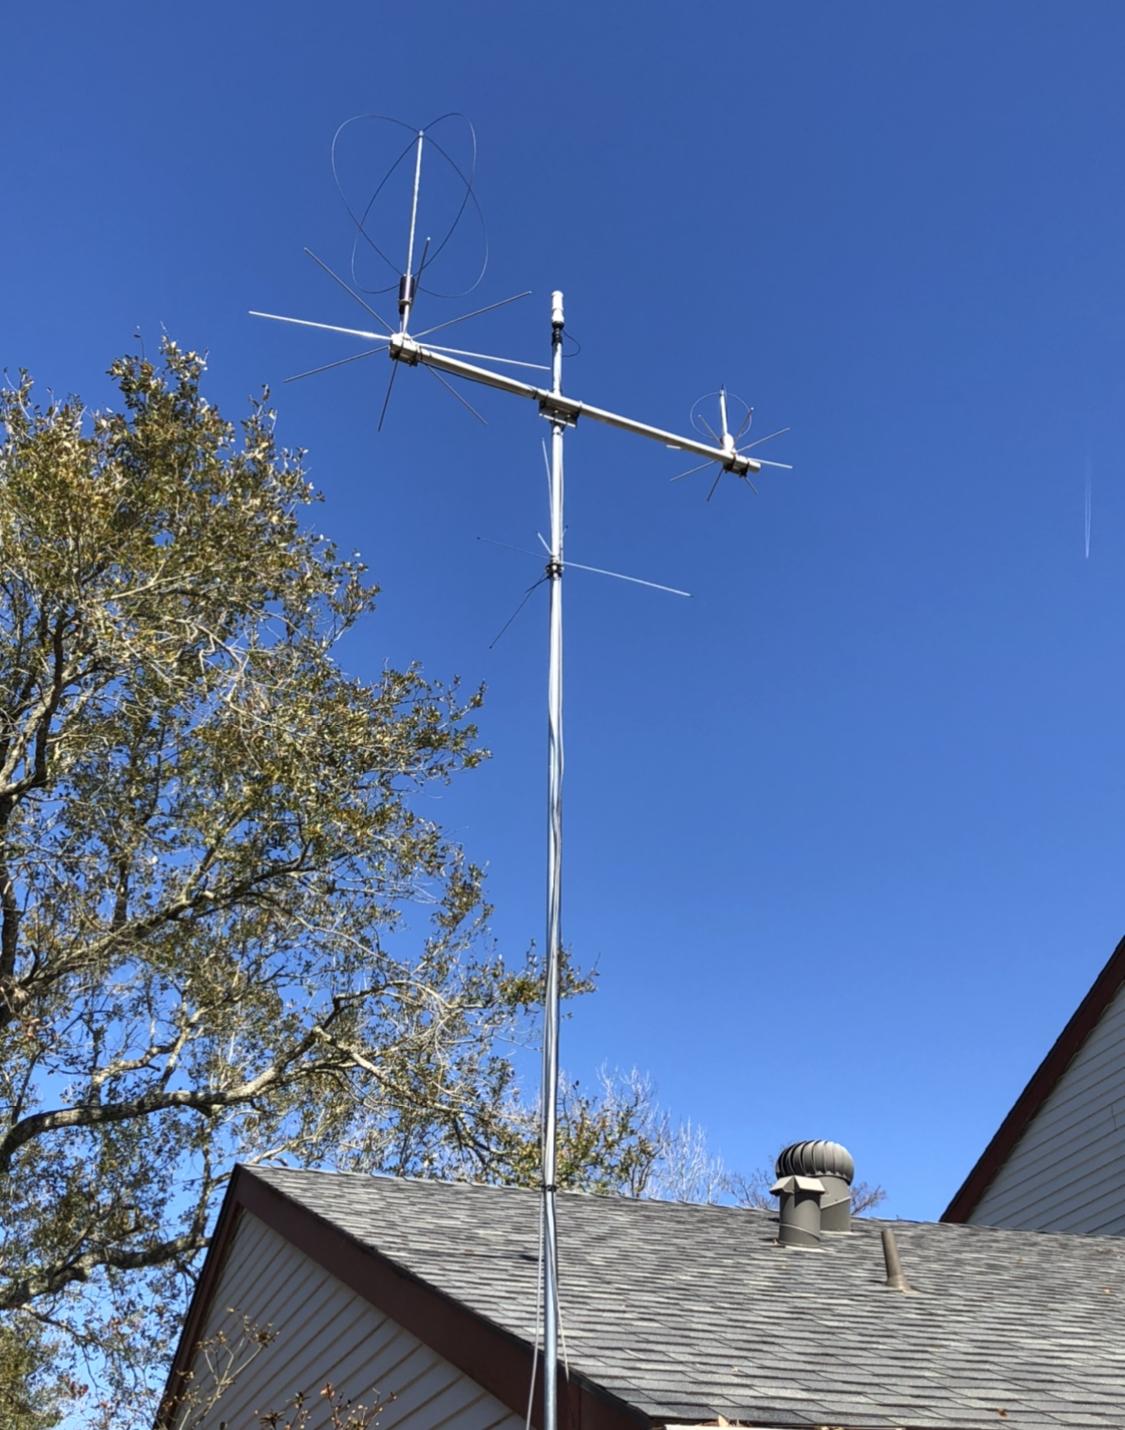 KD5QZG - UHF